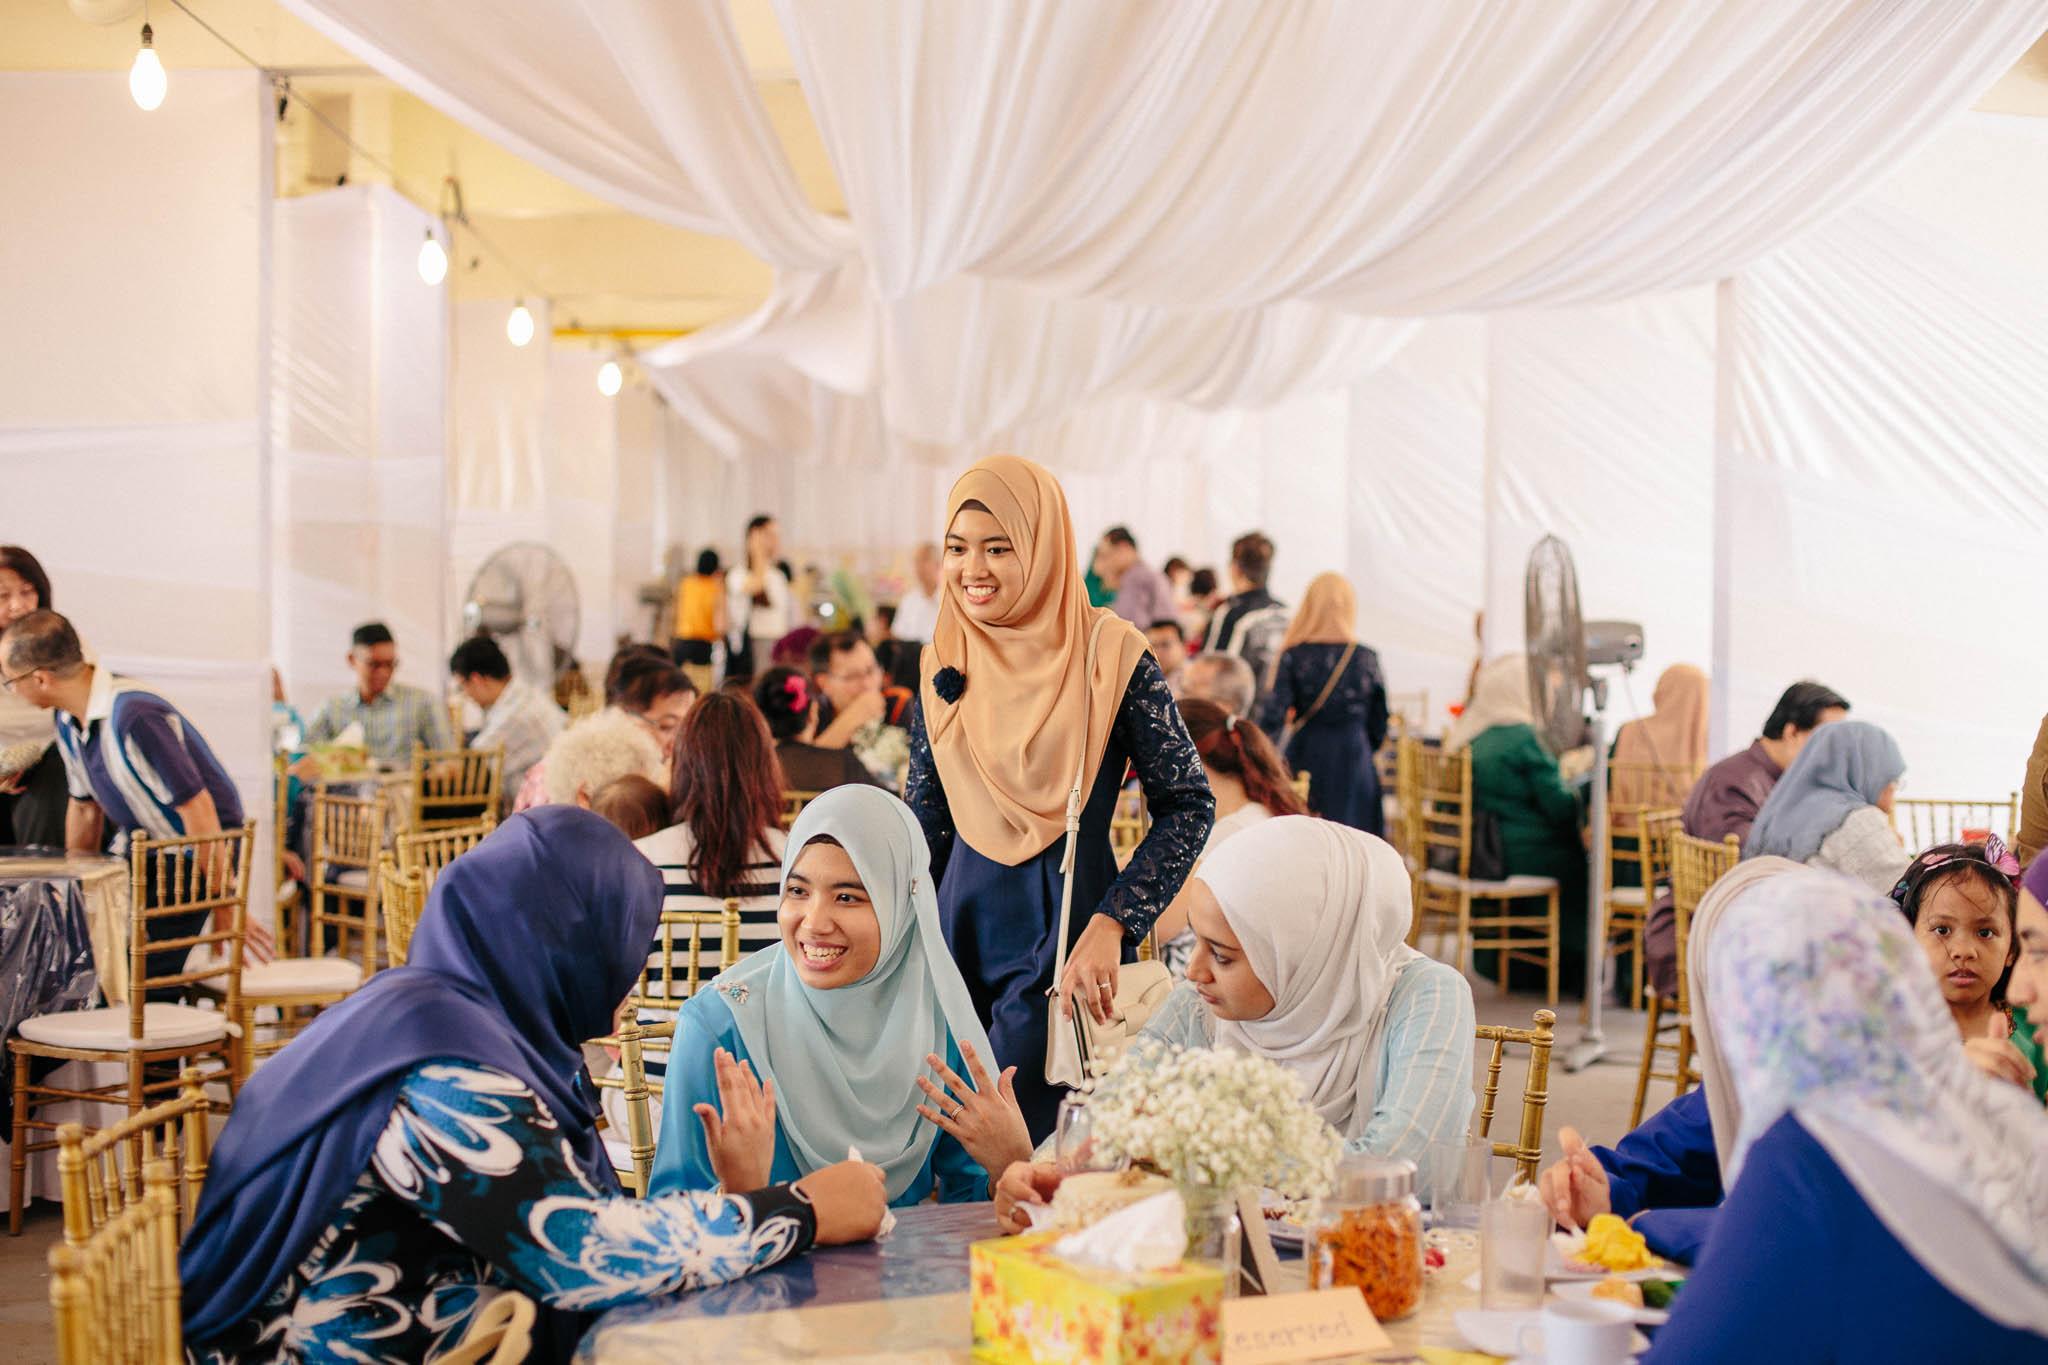 singapore-wedding-photographer-sharalyn-syazwan-025.jpg